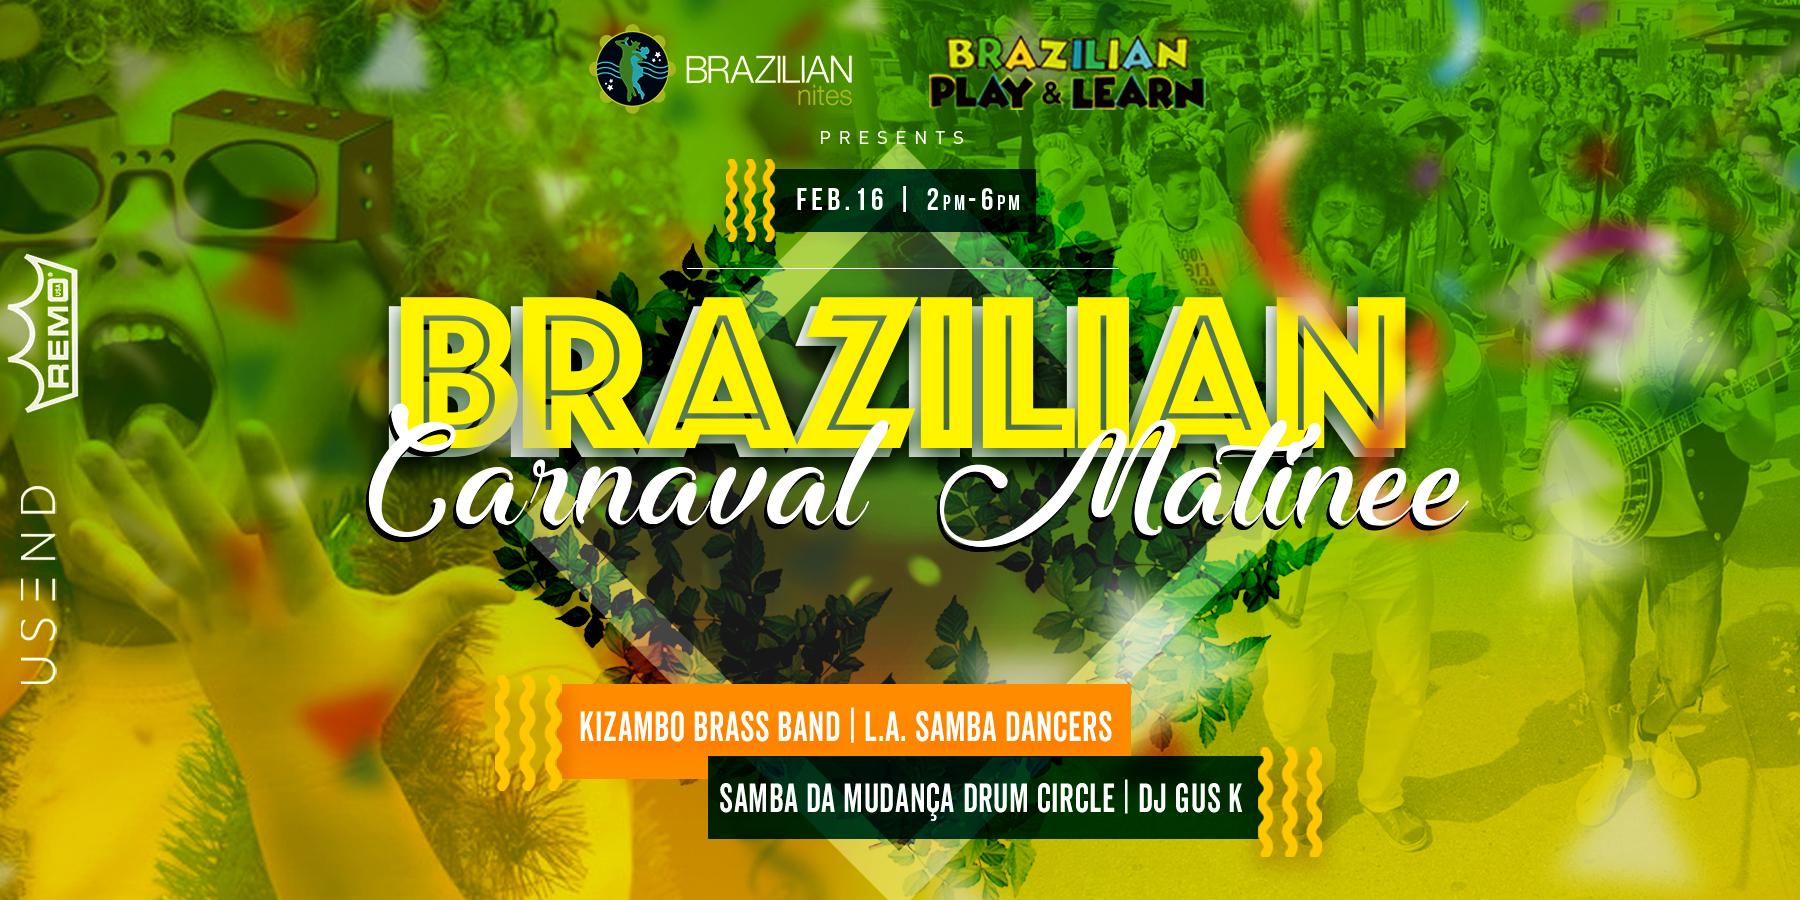 Brazilian Carnaval Mardi Gras Matinee